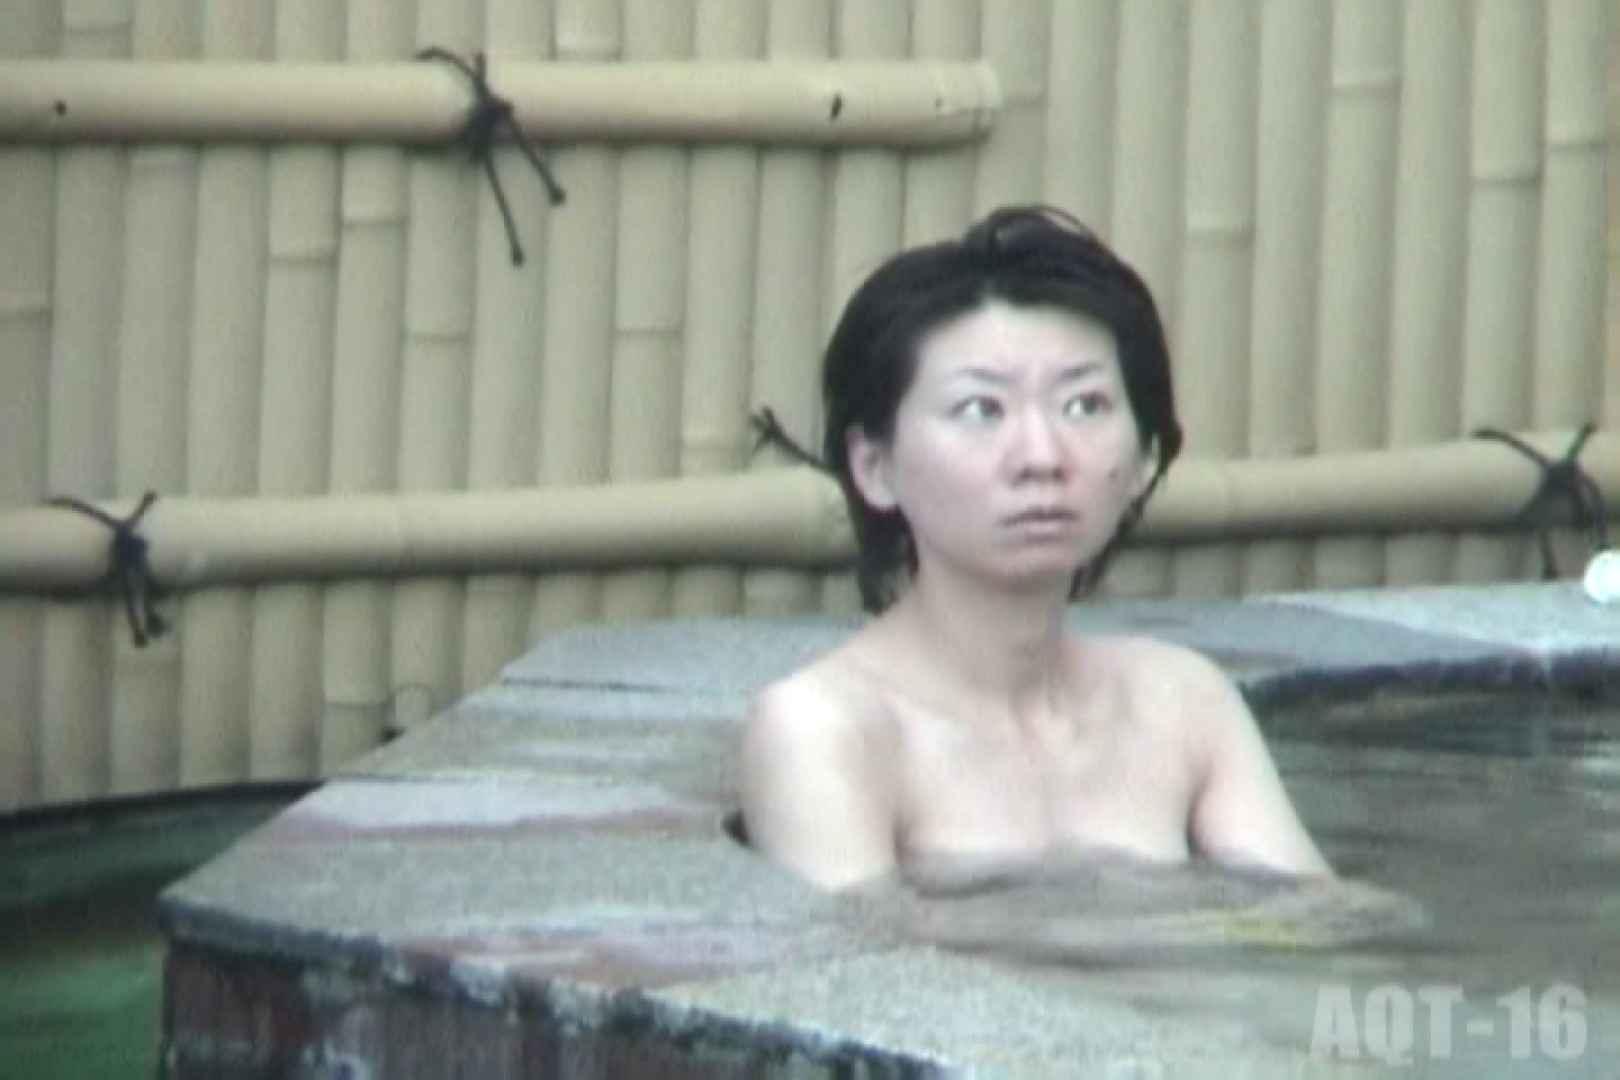 Aquaな露天風呂Vol.842 露天風呂編 | 盗撮シリーズ  82PIX 31